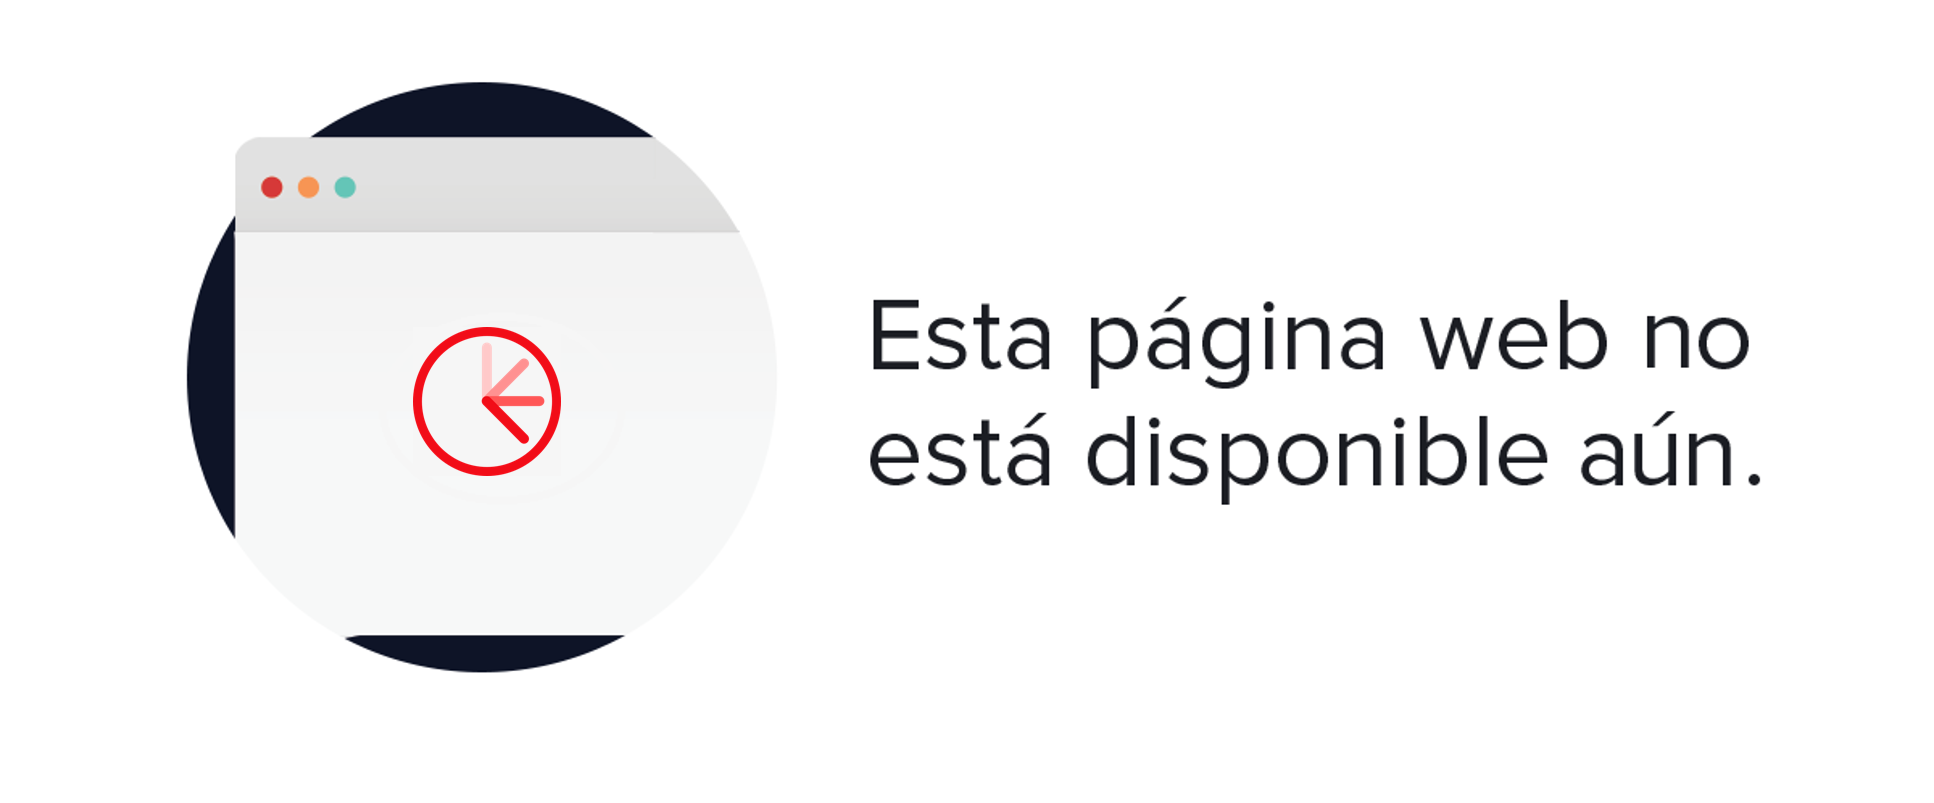 Easy Wear - Pantalón recto de mujer Easy Wear con cremalleras Verde oscuro 001041572101560036 - TLHHEKT